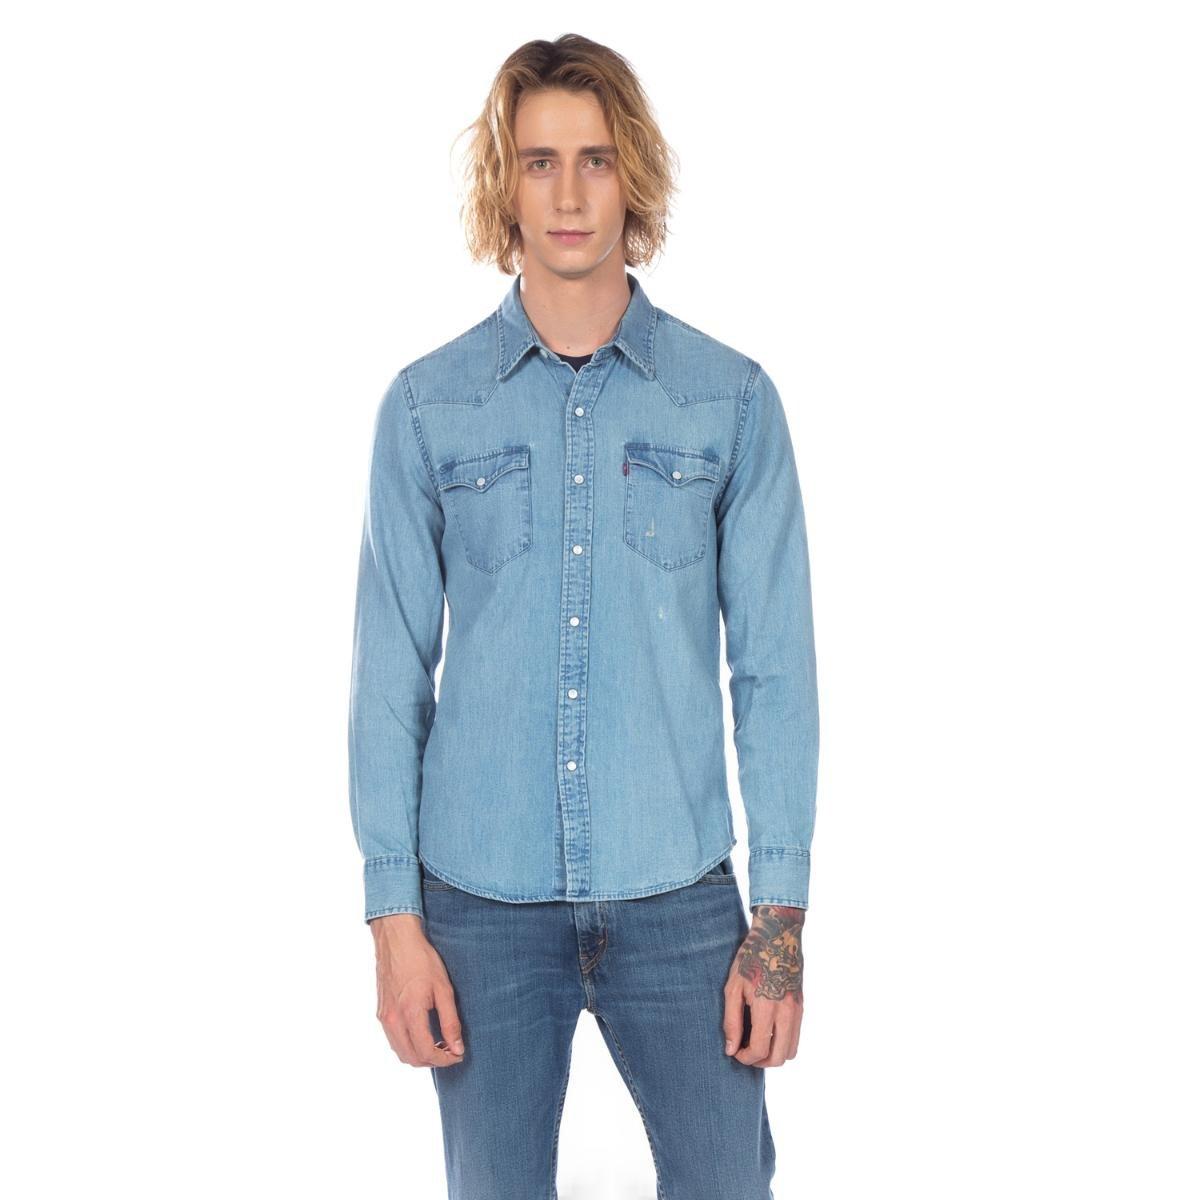 Camisa Levis Jeans Masculino Classic Western - Compre Agora  1f61a332a7c